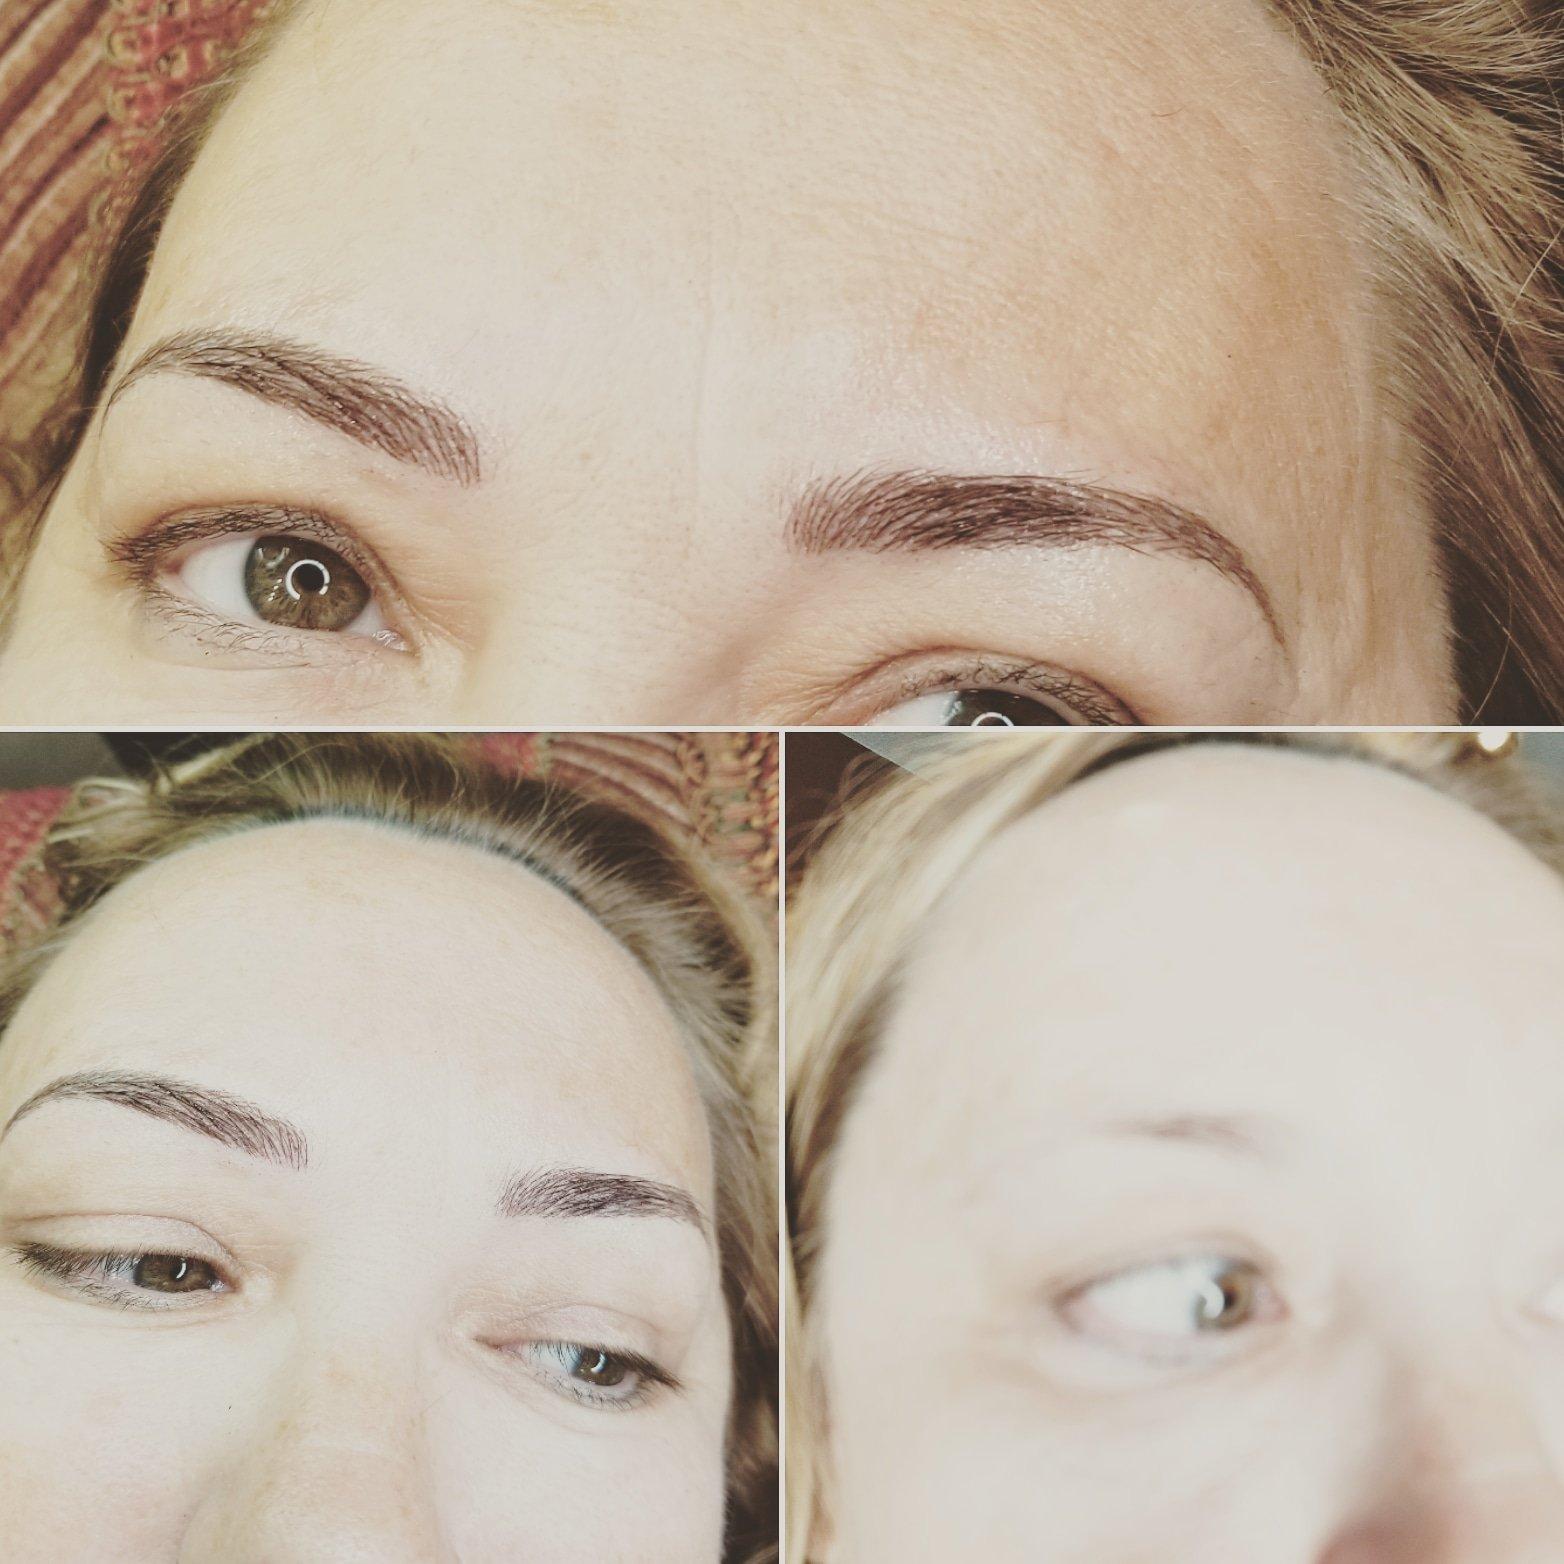 Envy brows N lashes image 11